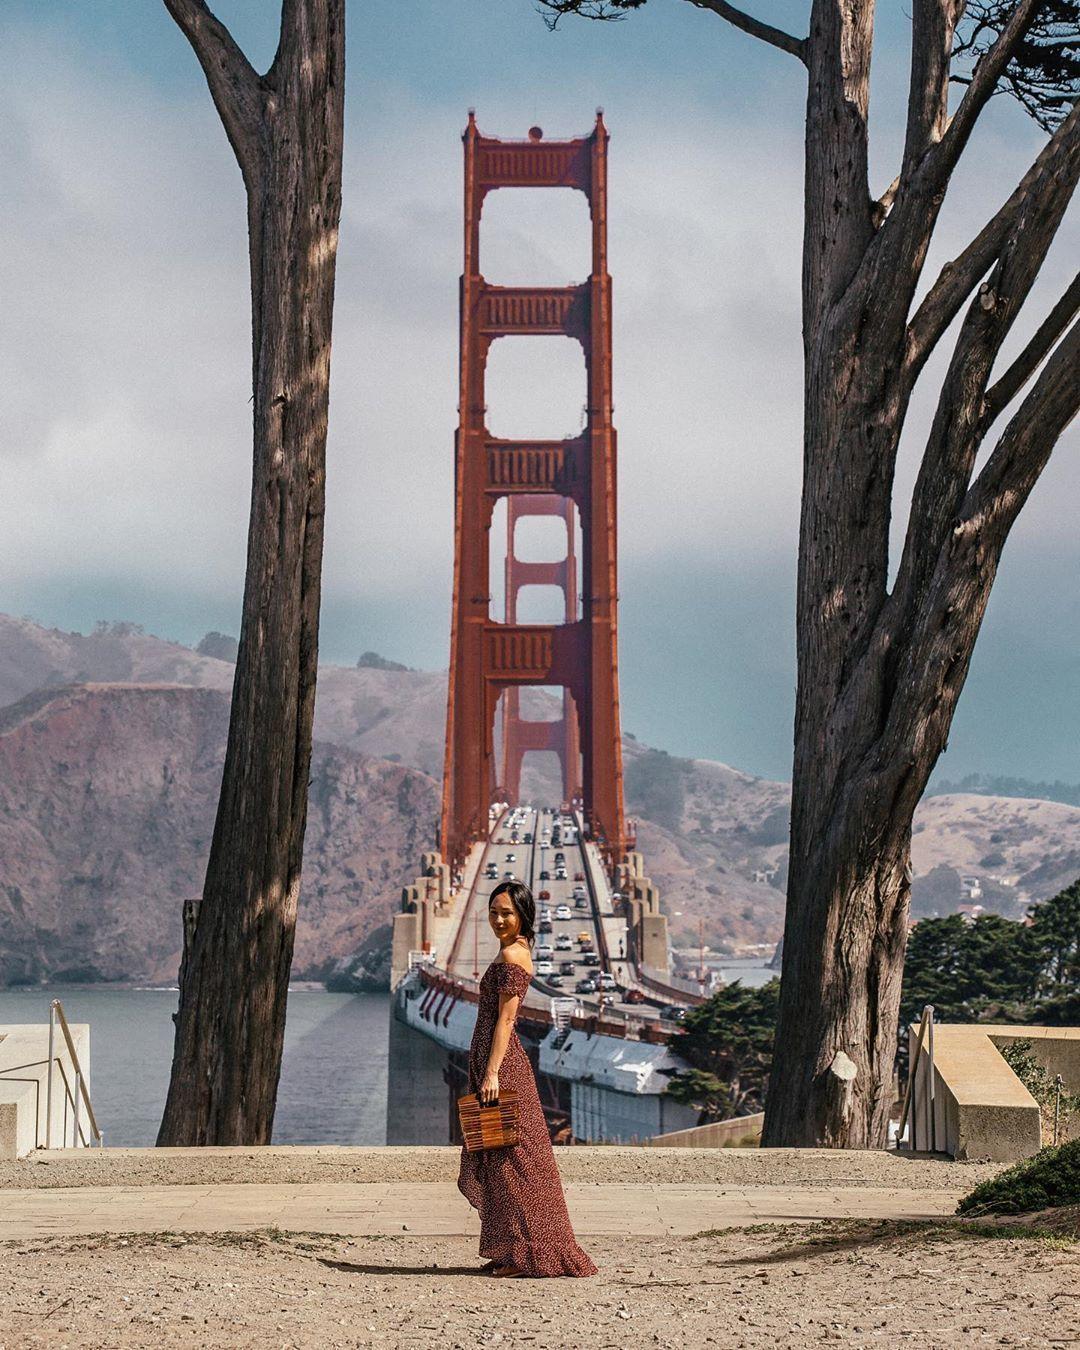 Golden Gate Overlook San Francisco California In 2020 Golden Gate Bridge Golden Gate Photo Location